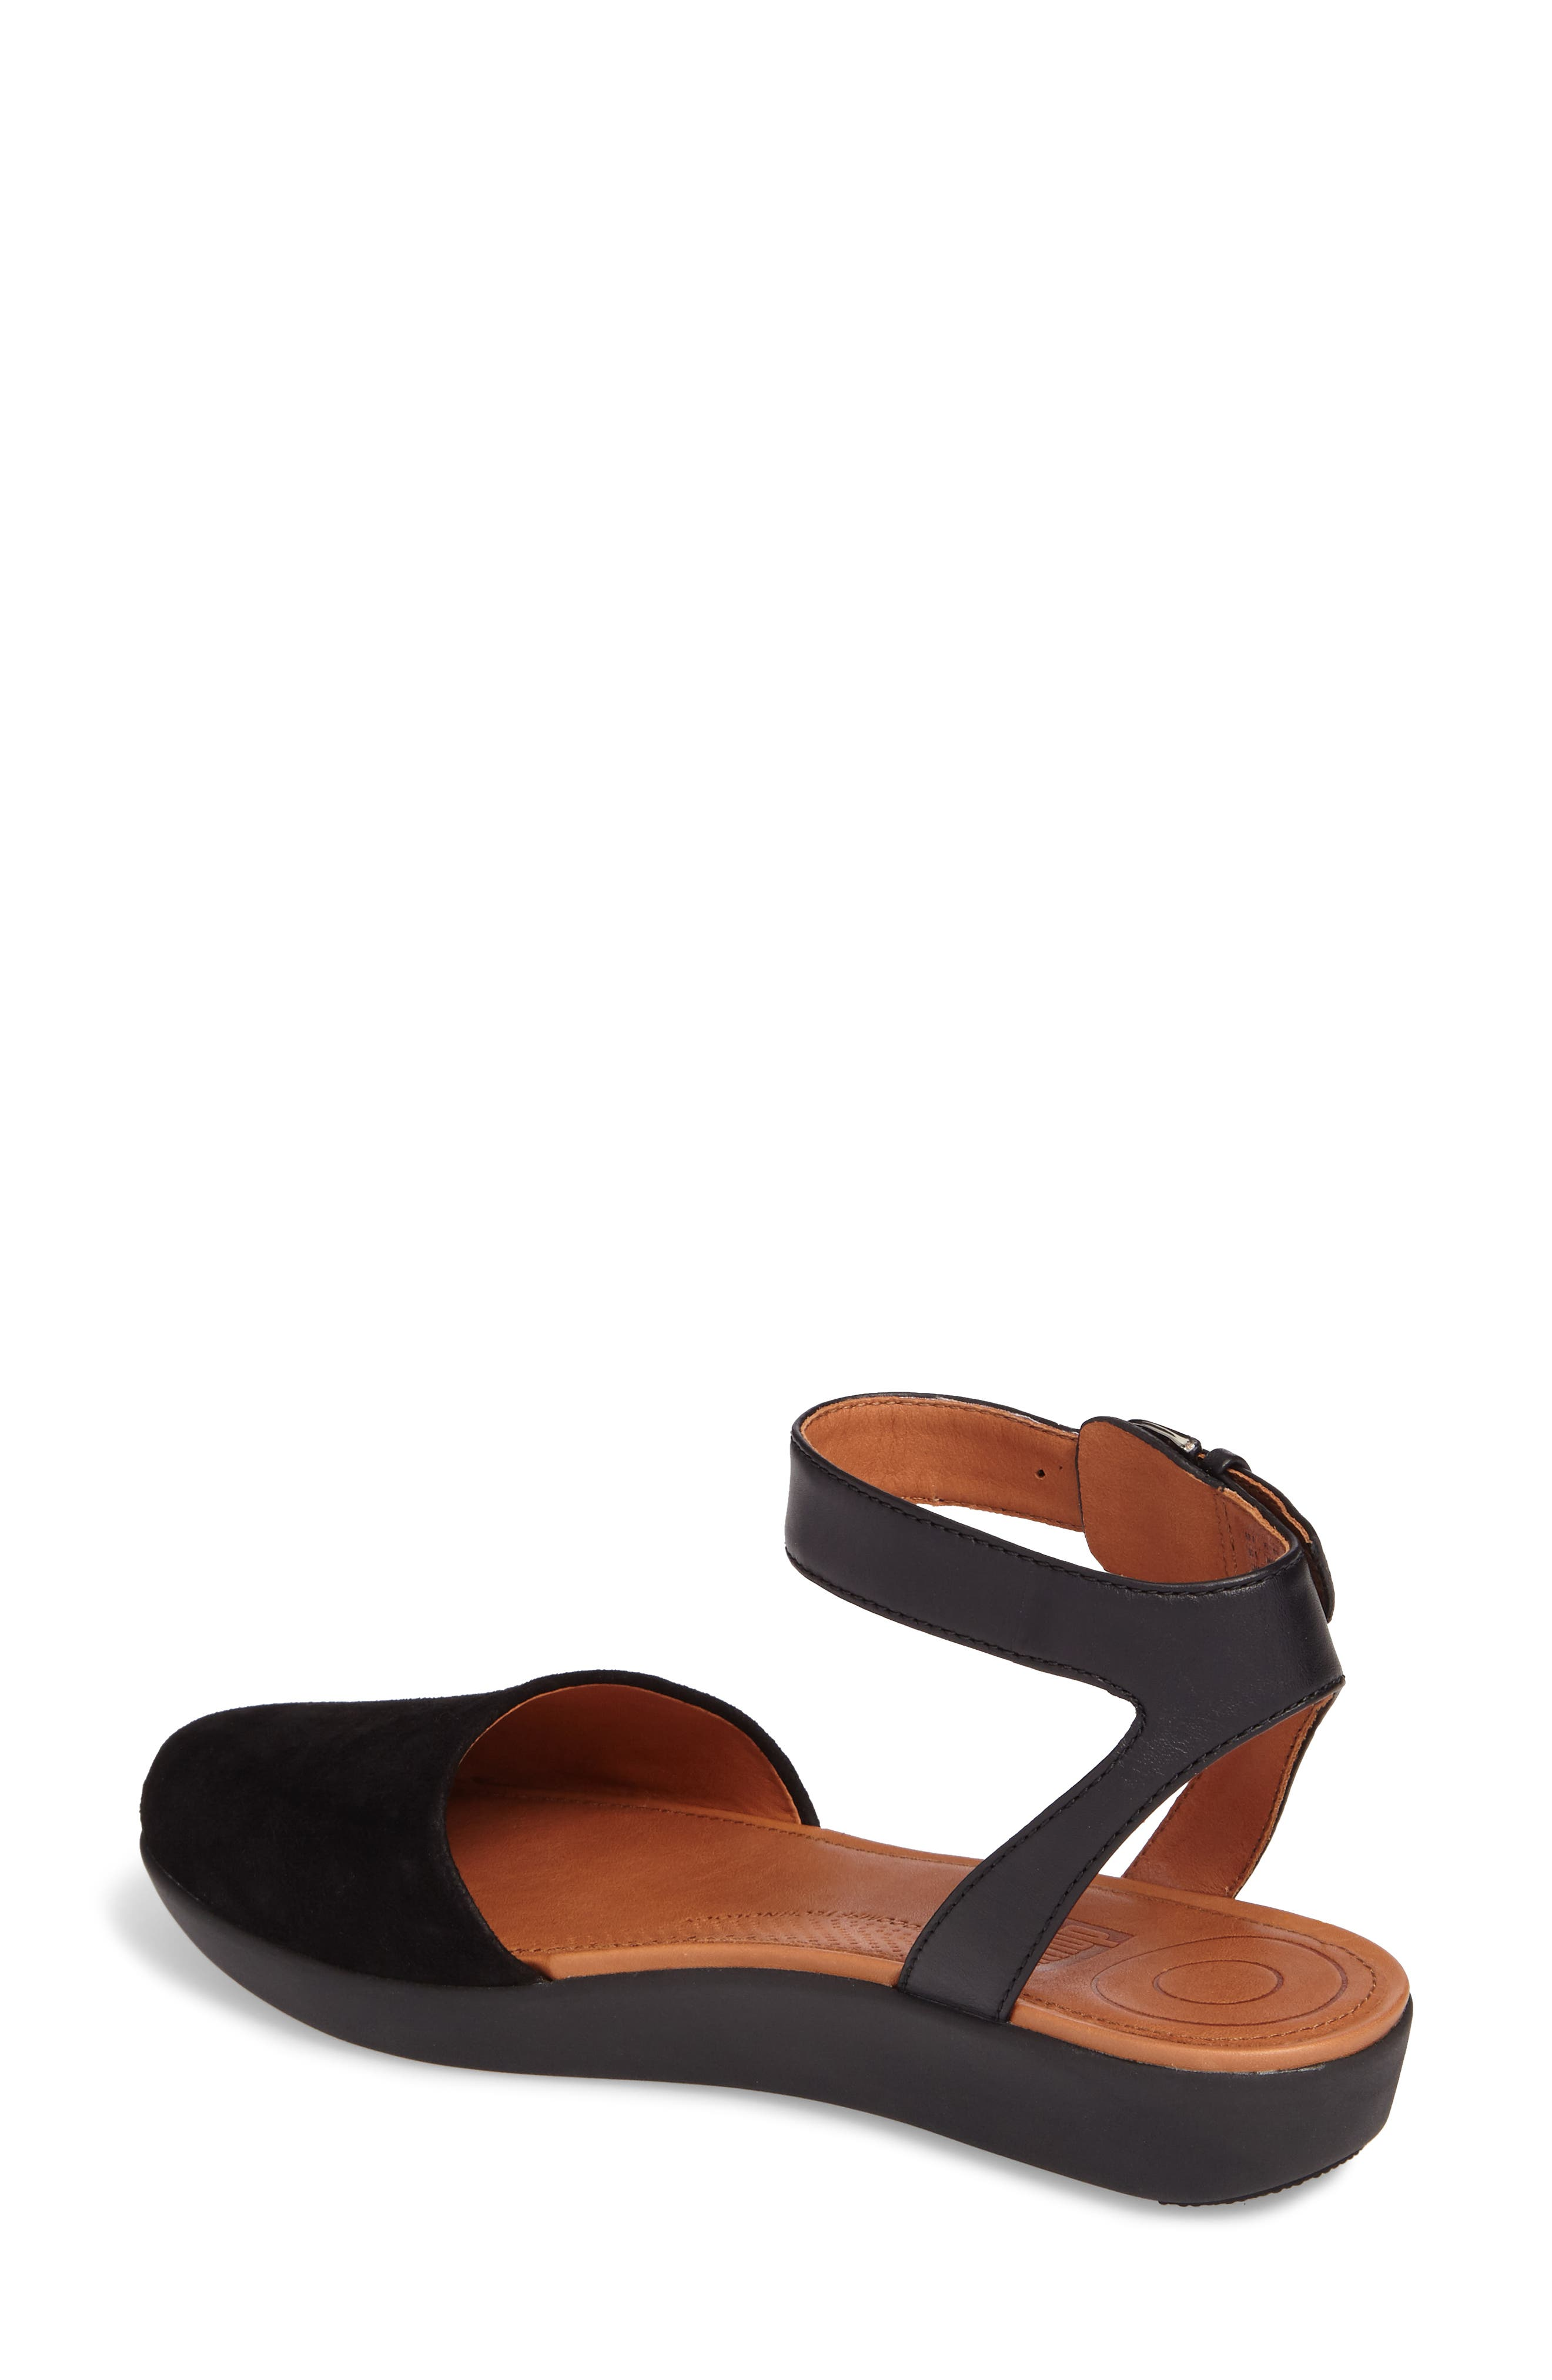 Cova Ankle Strap Sandal,                             Alternate thumbnail 2, color,                             001